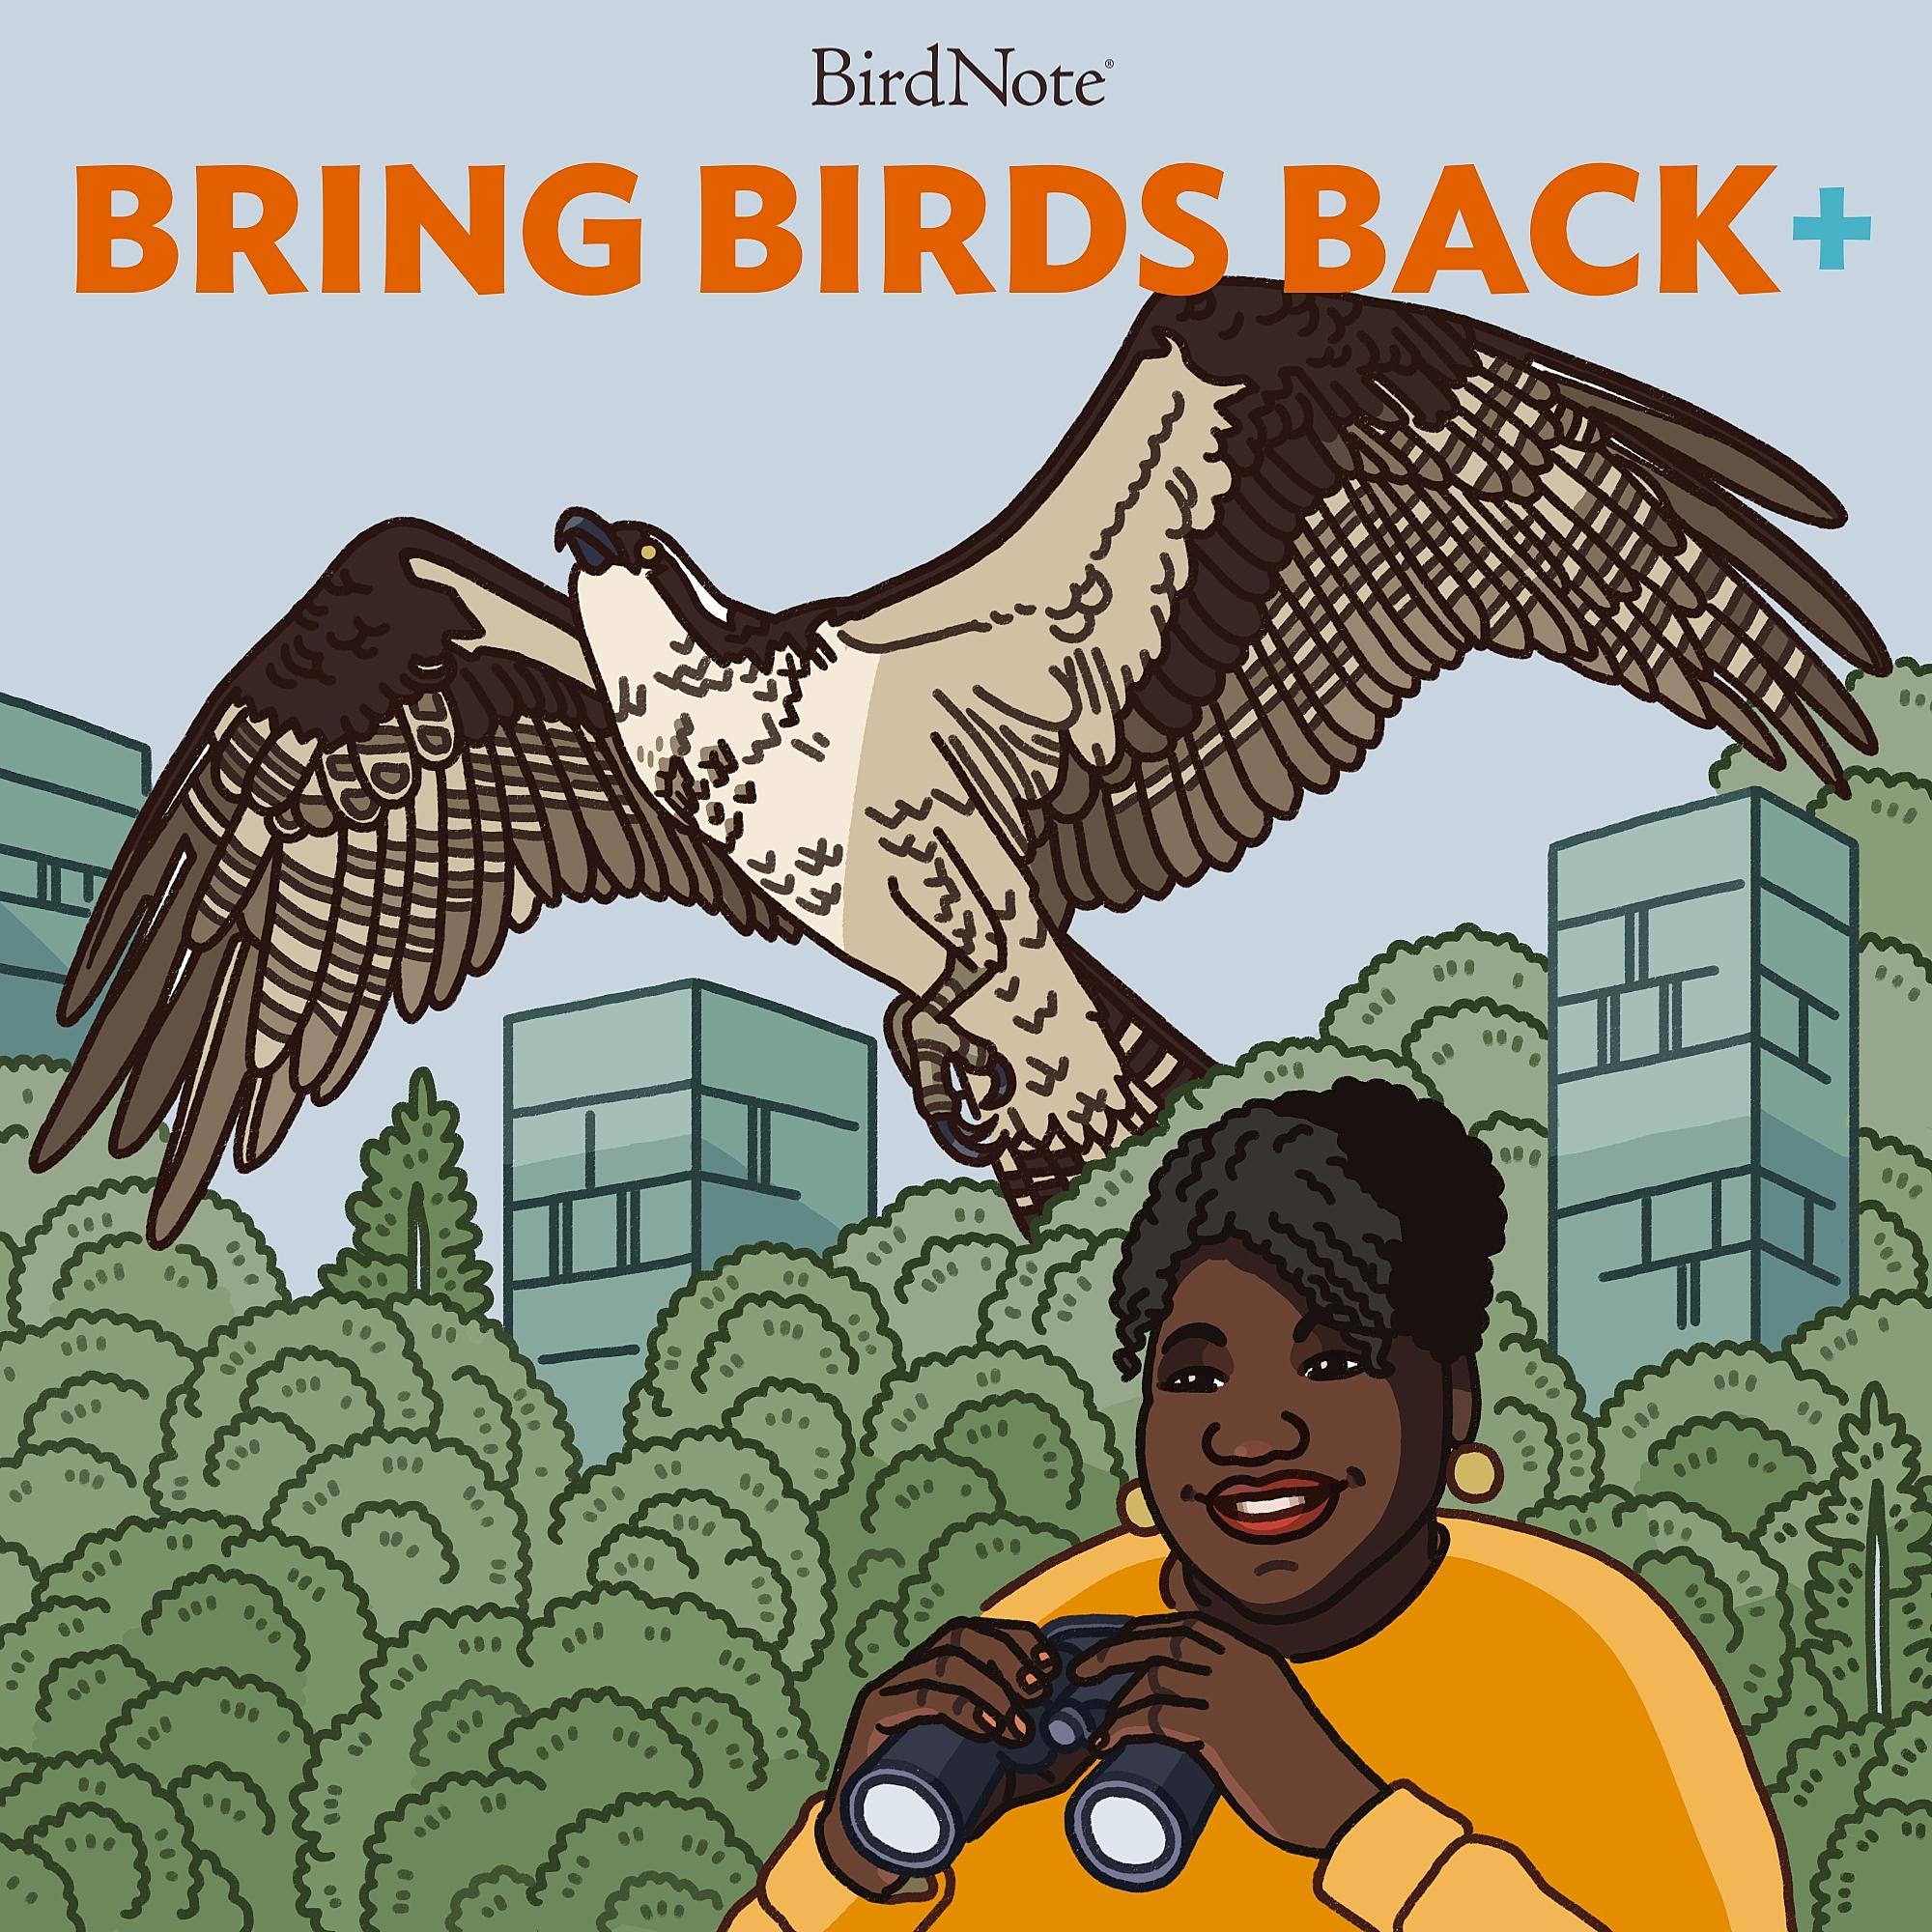 Bring Birds Back+